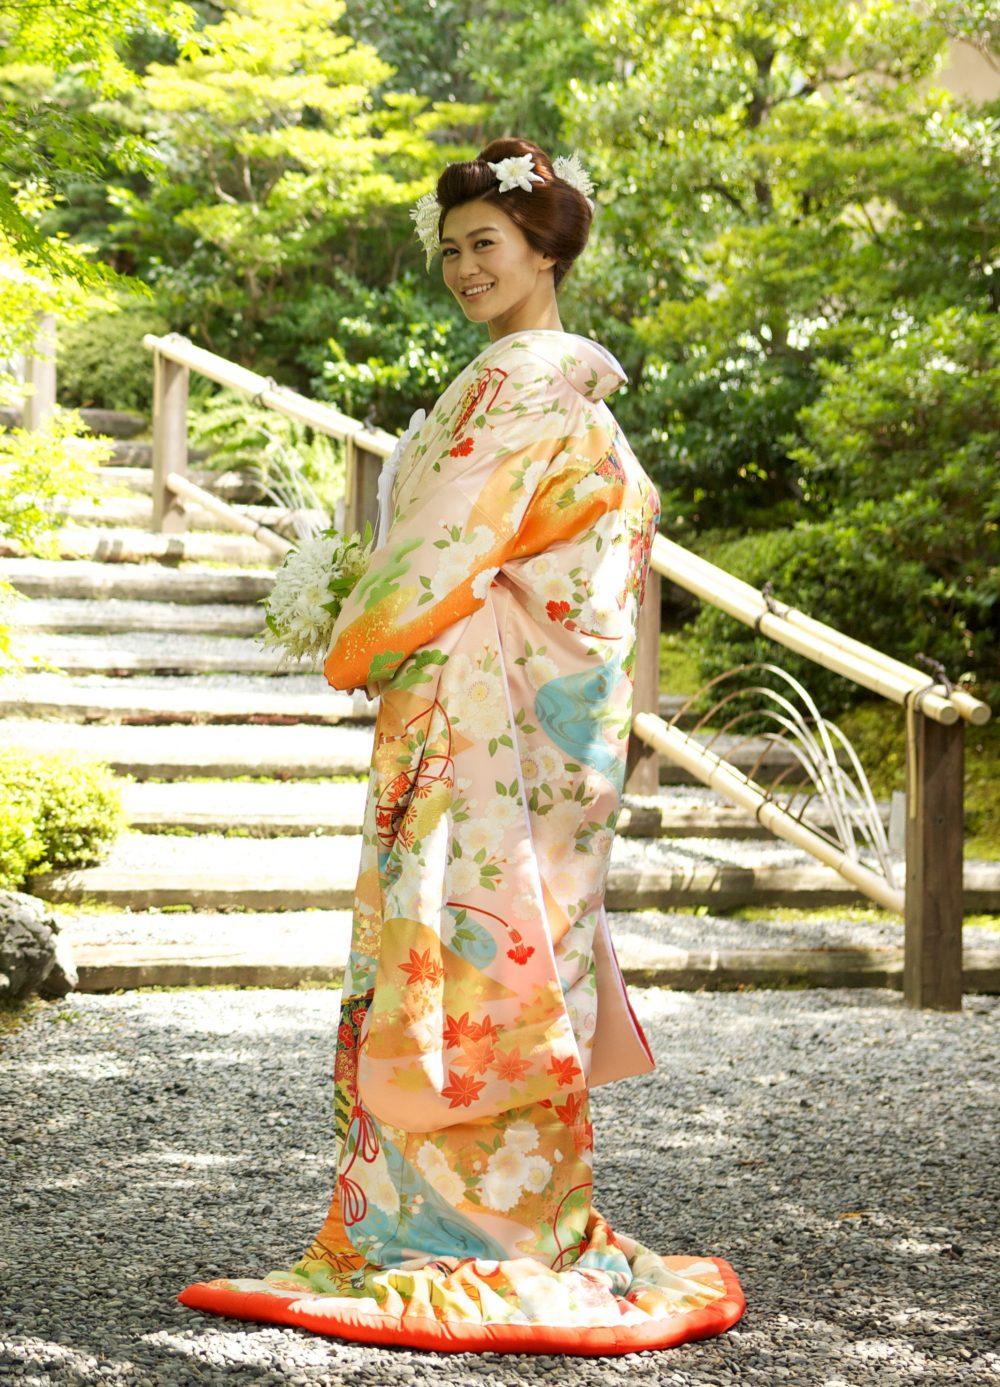 曲水桜楓の写真001